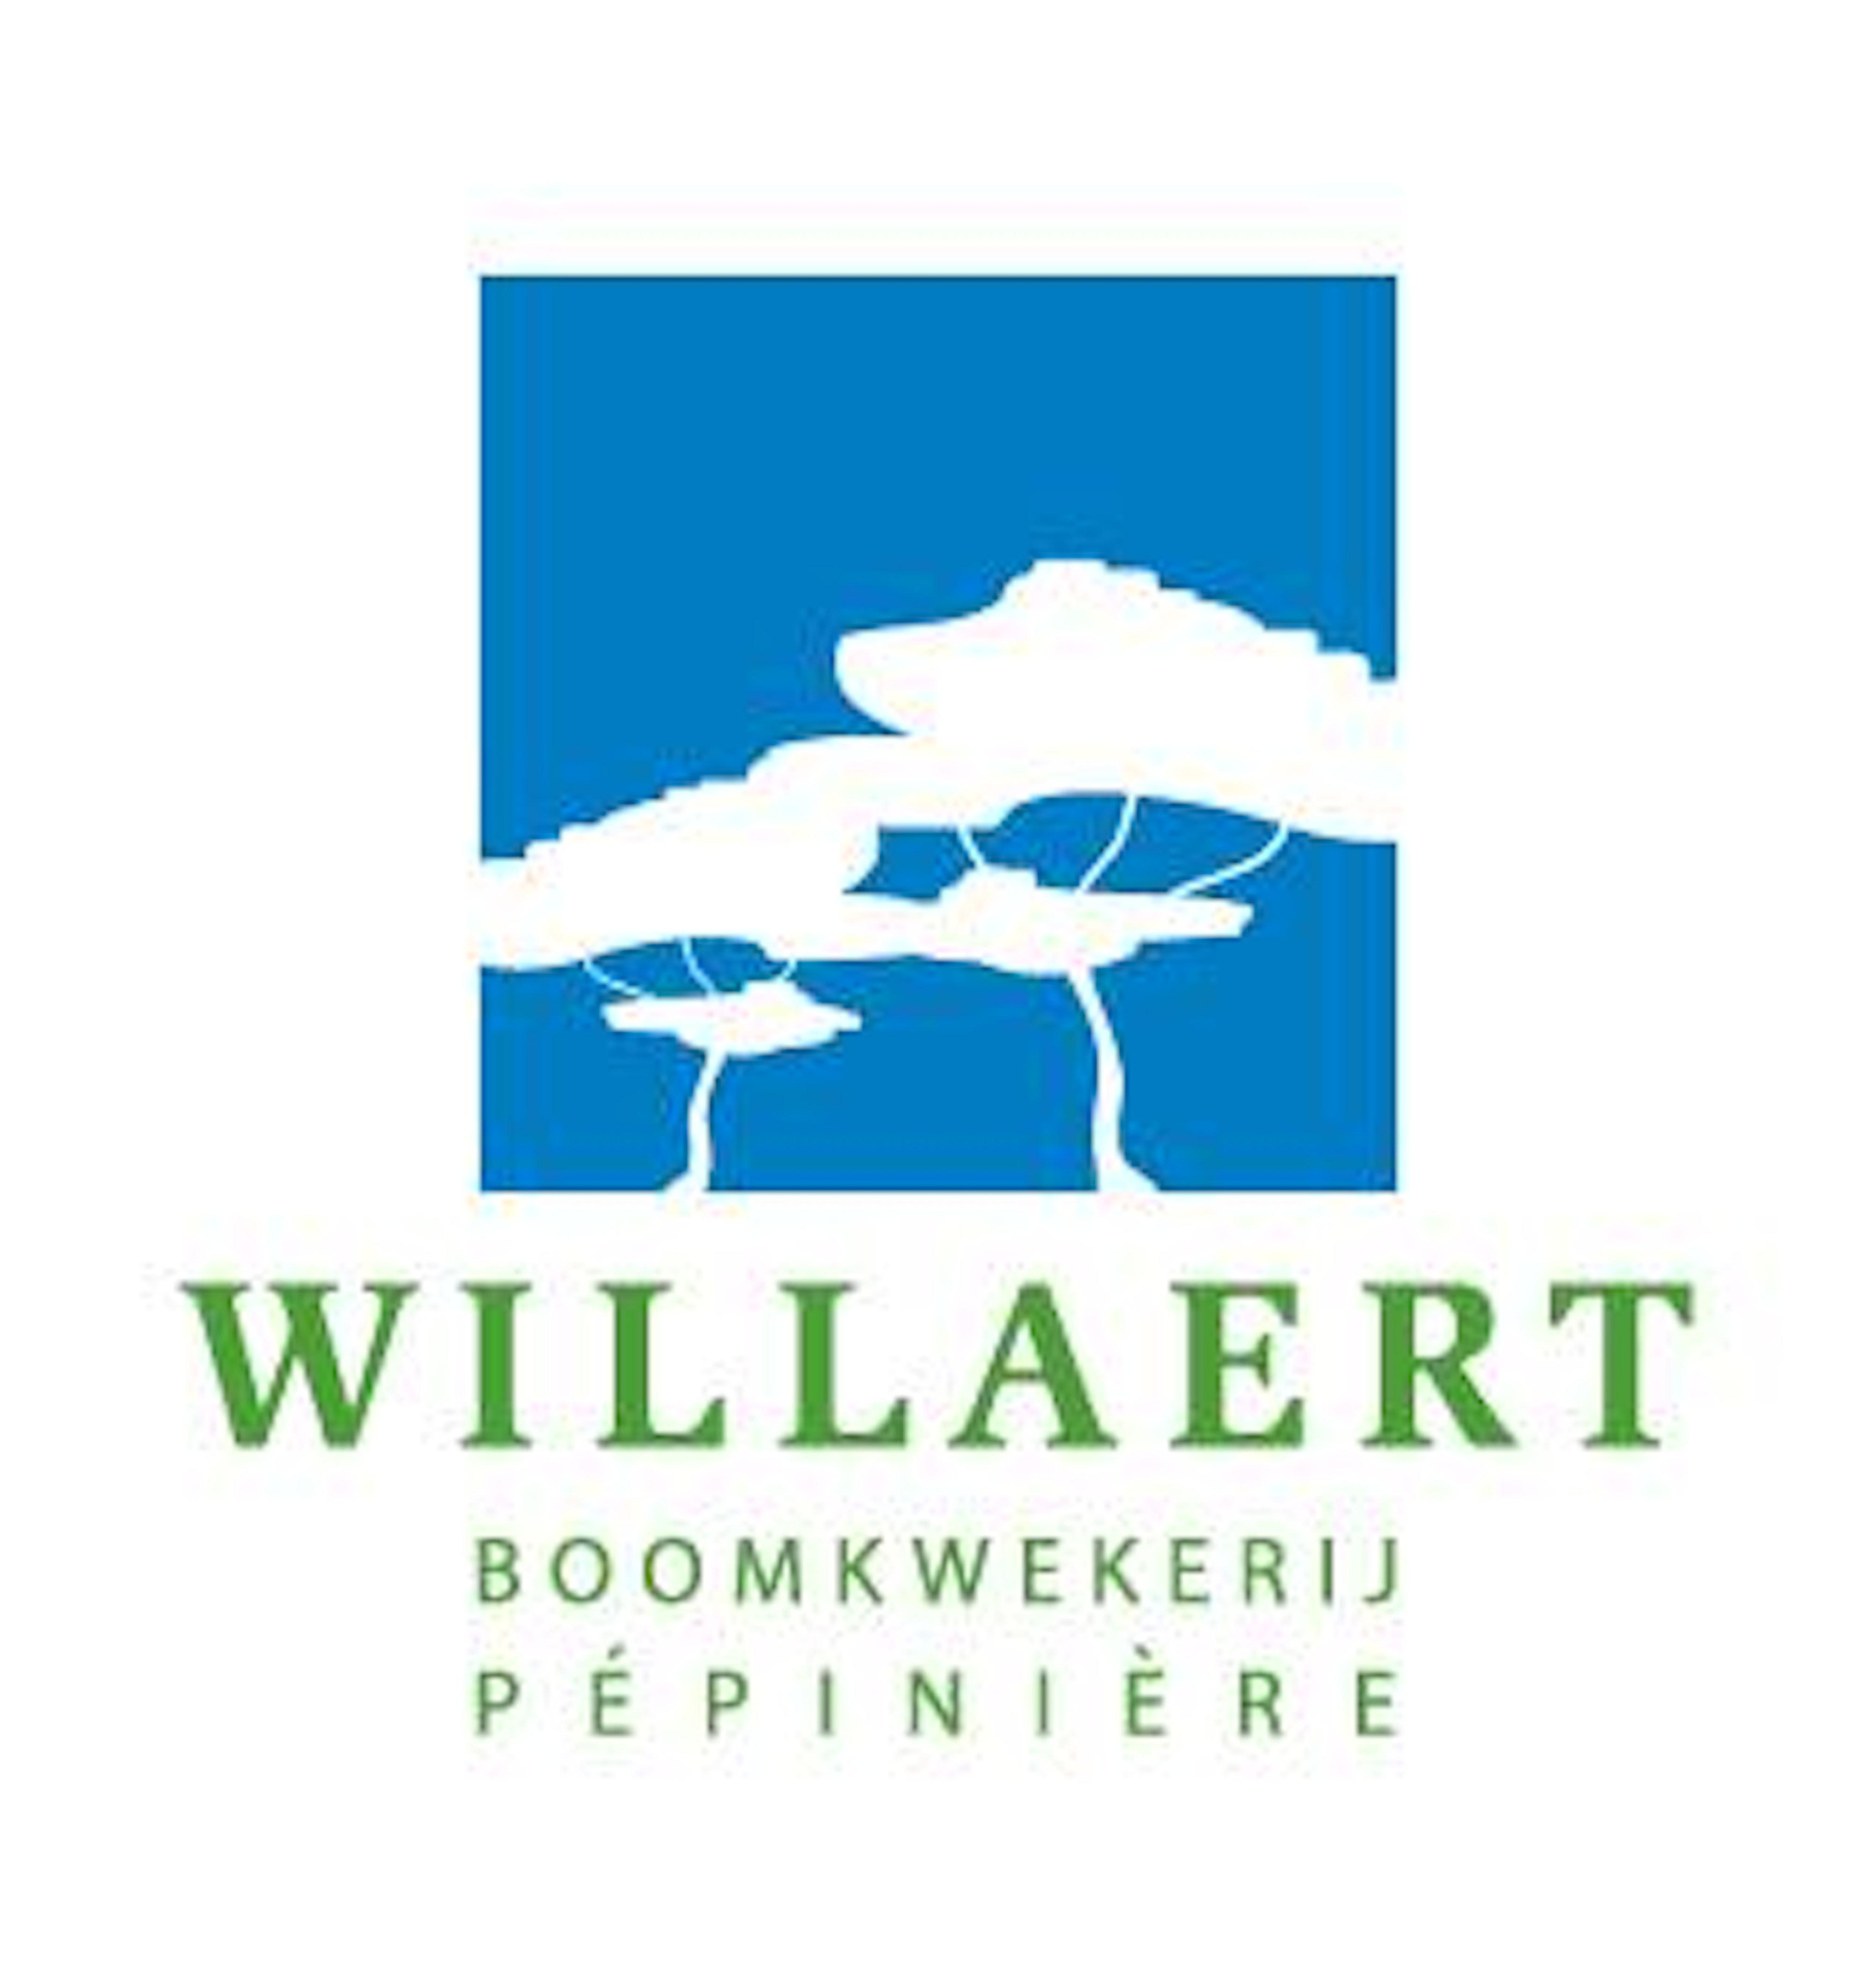 Boomkwekerij Willaert logo